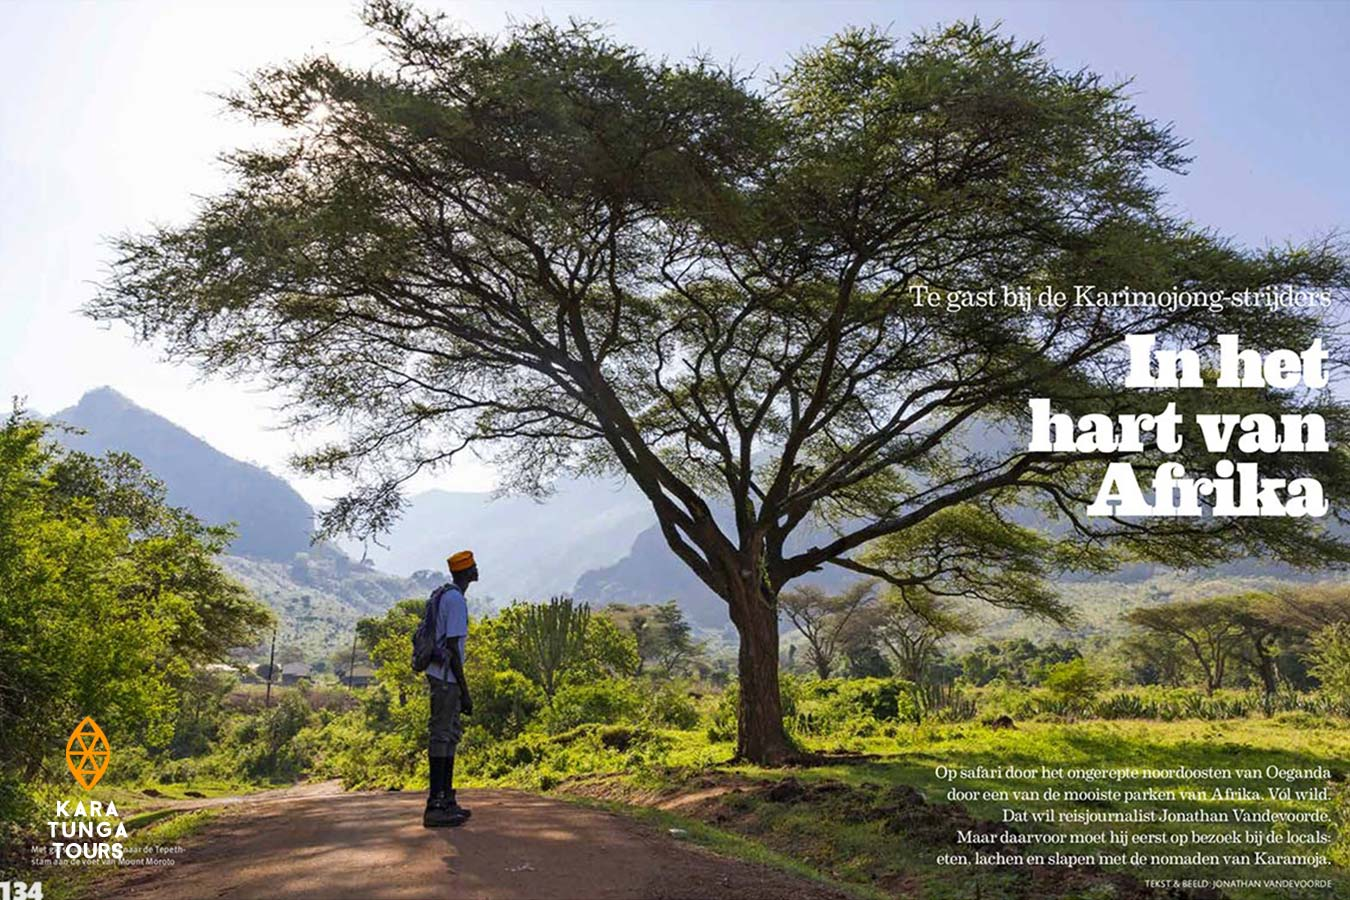 kara-tunga-zin-magazine-karamoja-uganda-tours-travel